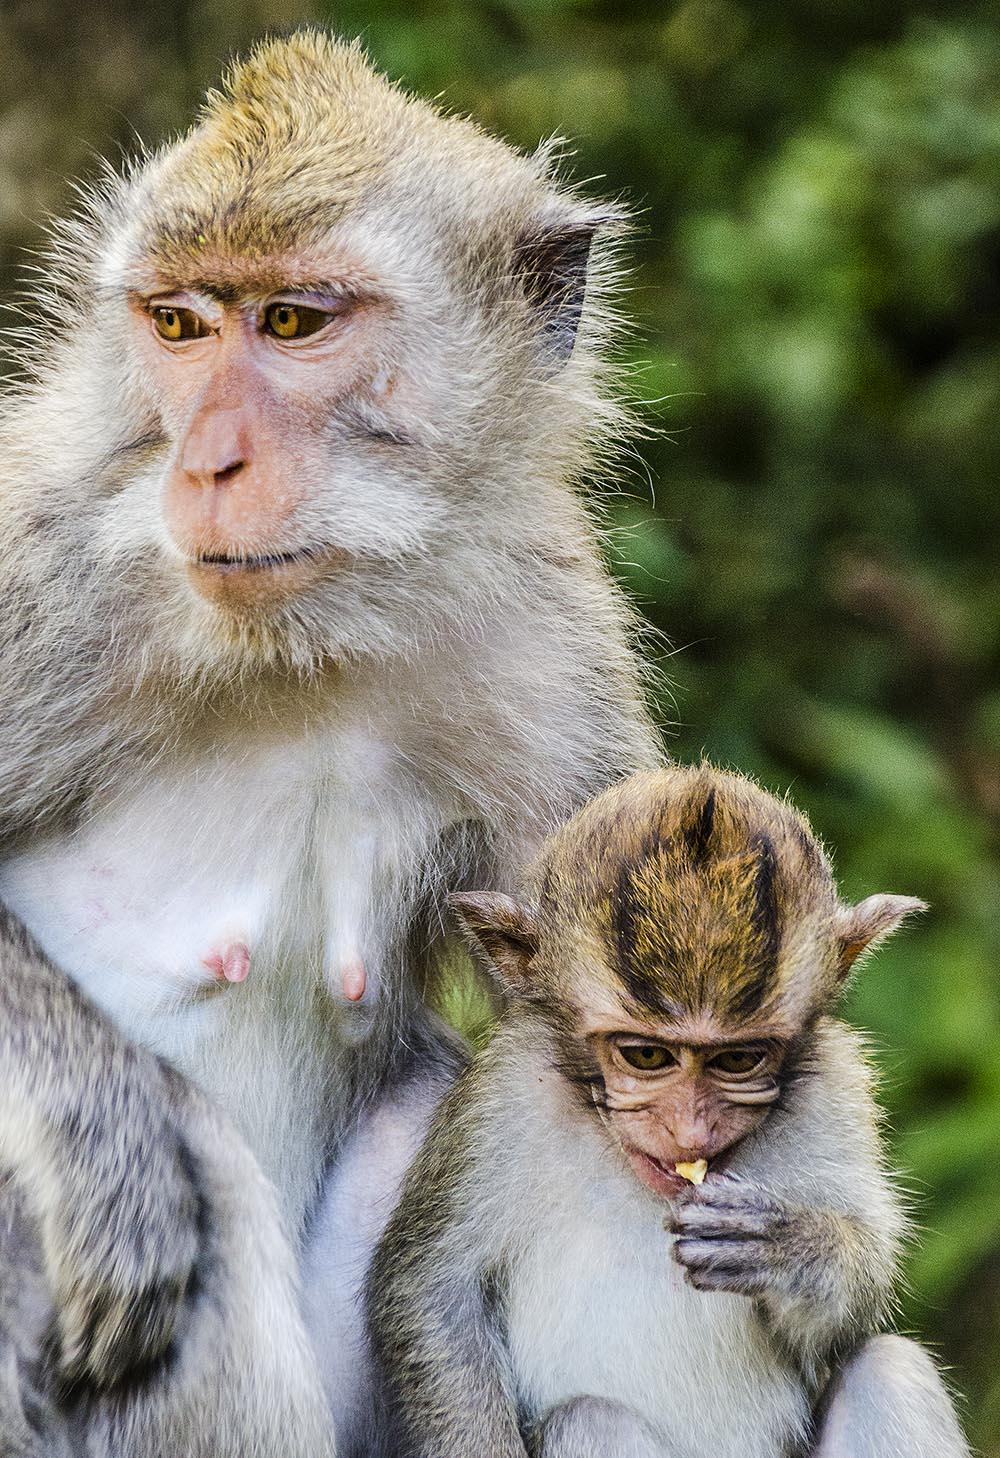 Monkey Forest Tours Bali